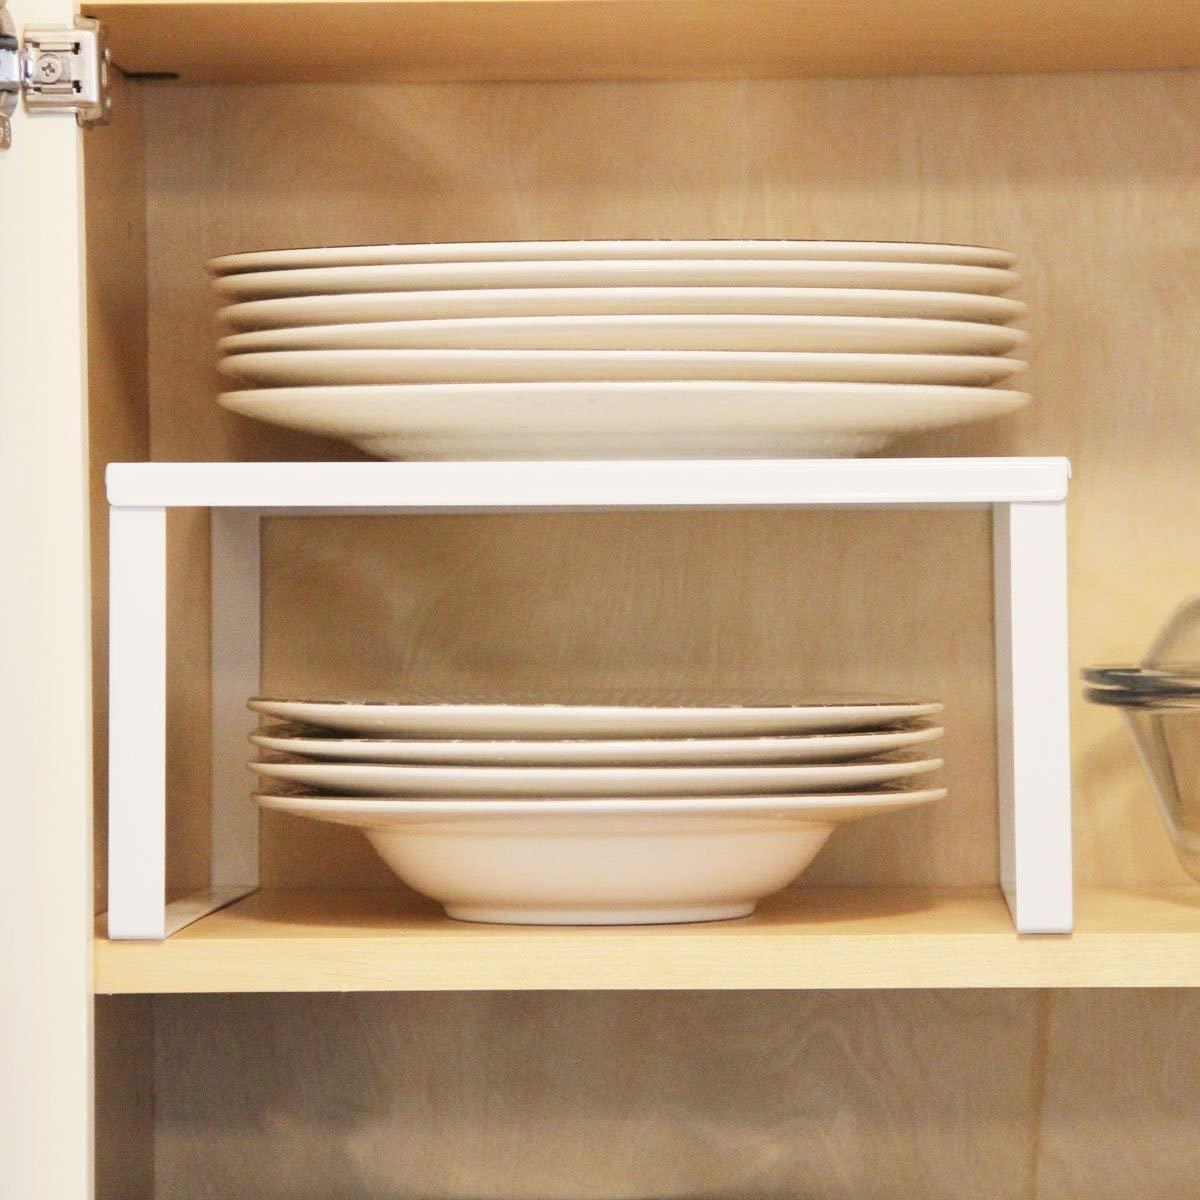 Cream White Metal Kitchen Cabinet and Counter Top Organizer Shelf, 13 inch Wide 11 inch deep